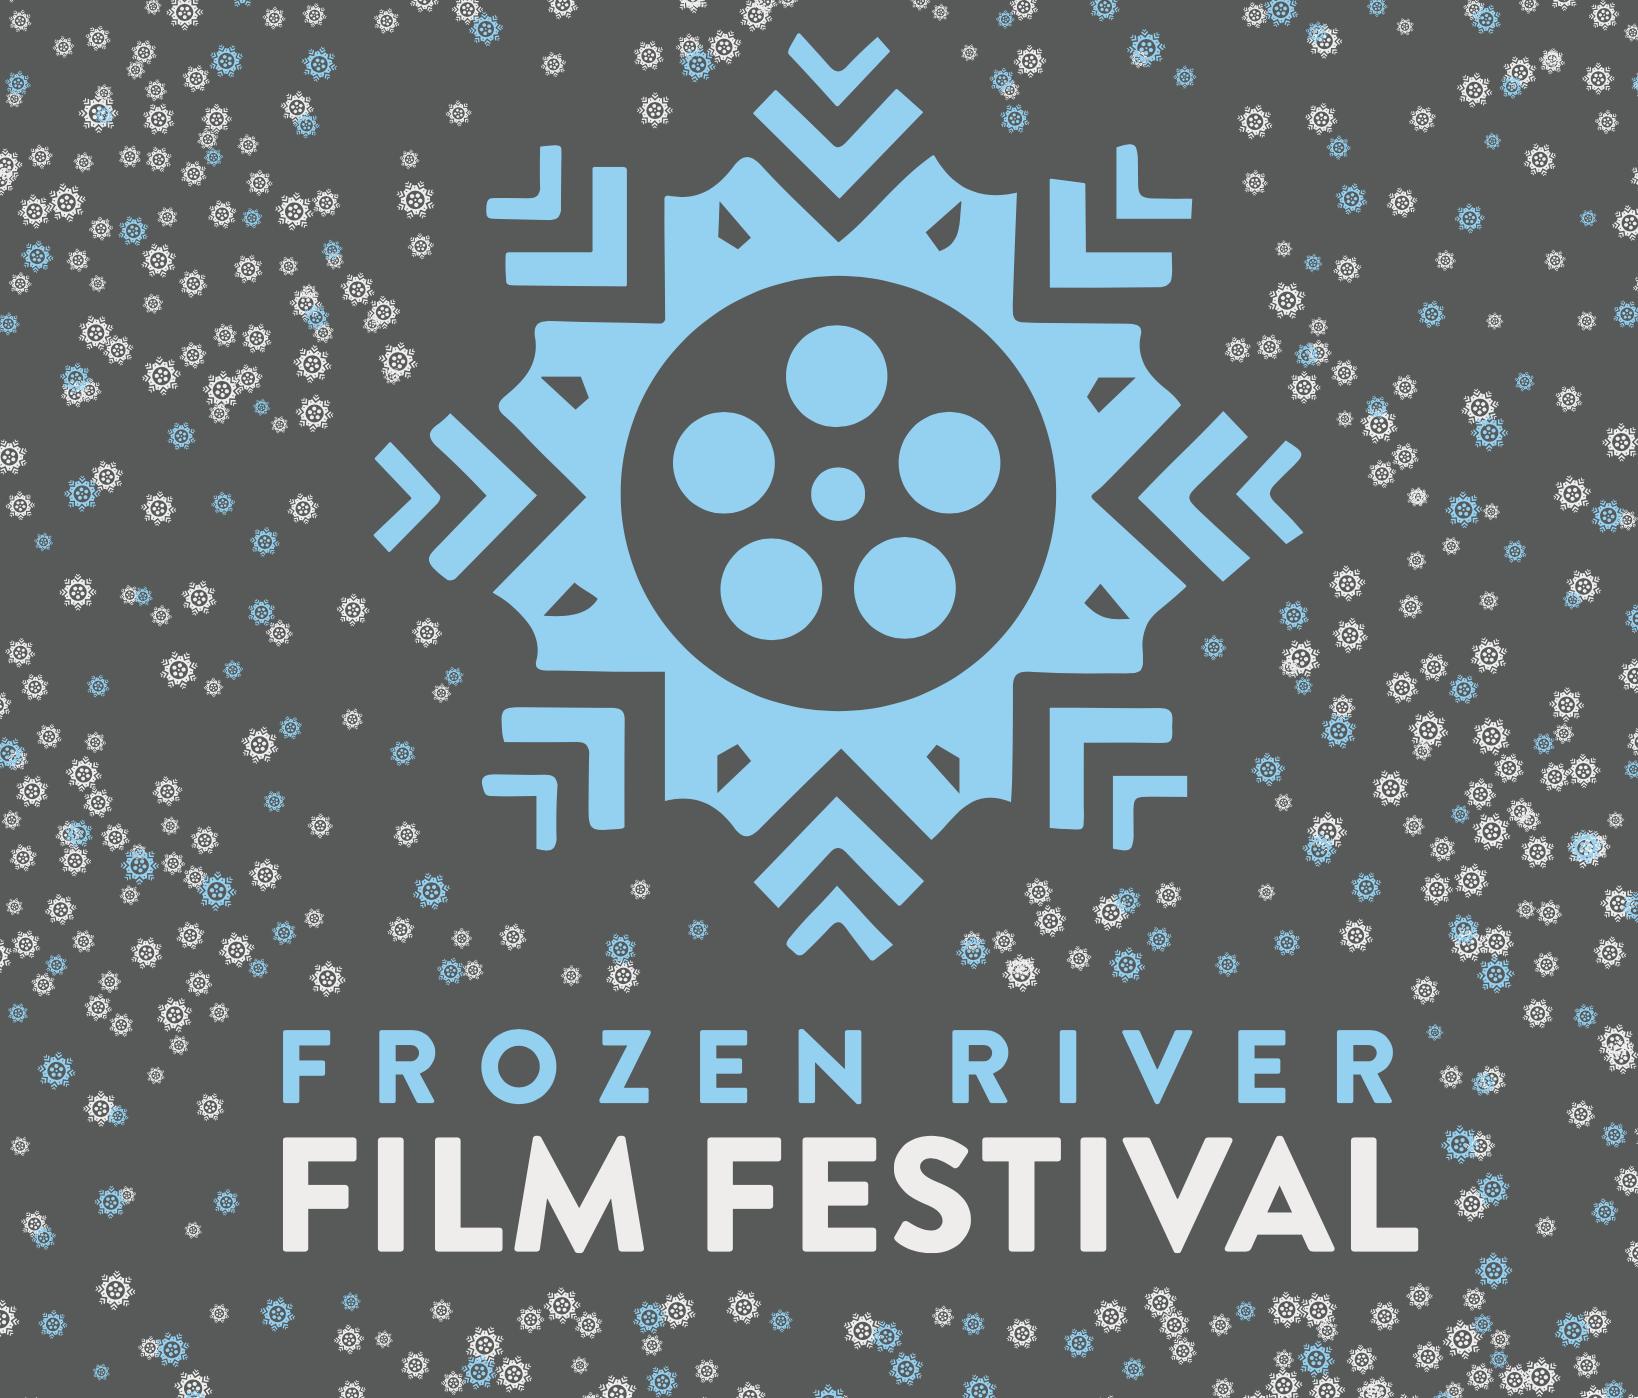 Frozen River Film Fest 2019: Astroknot!